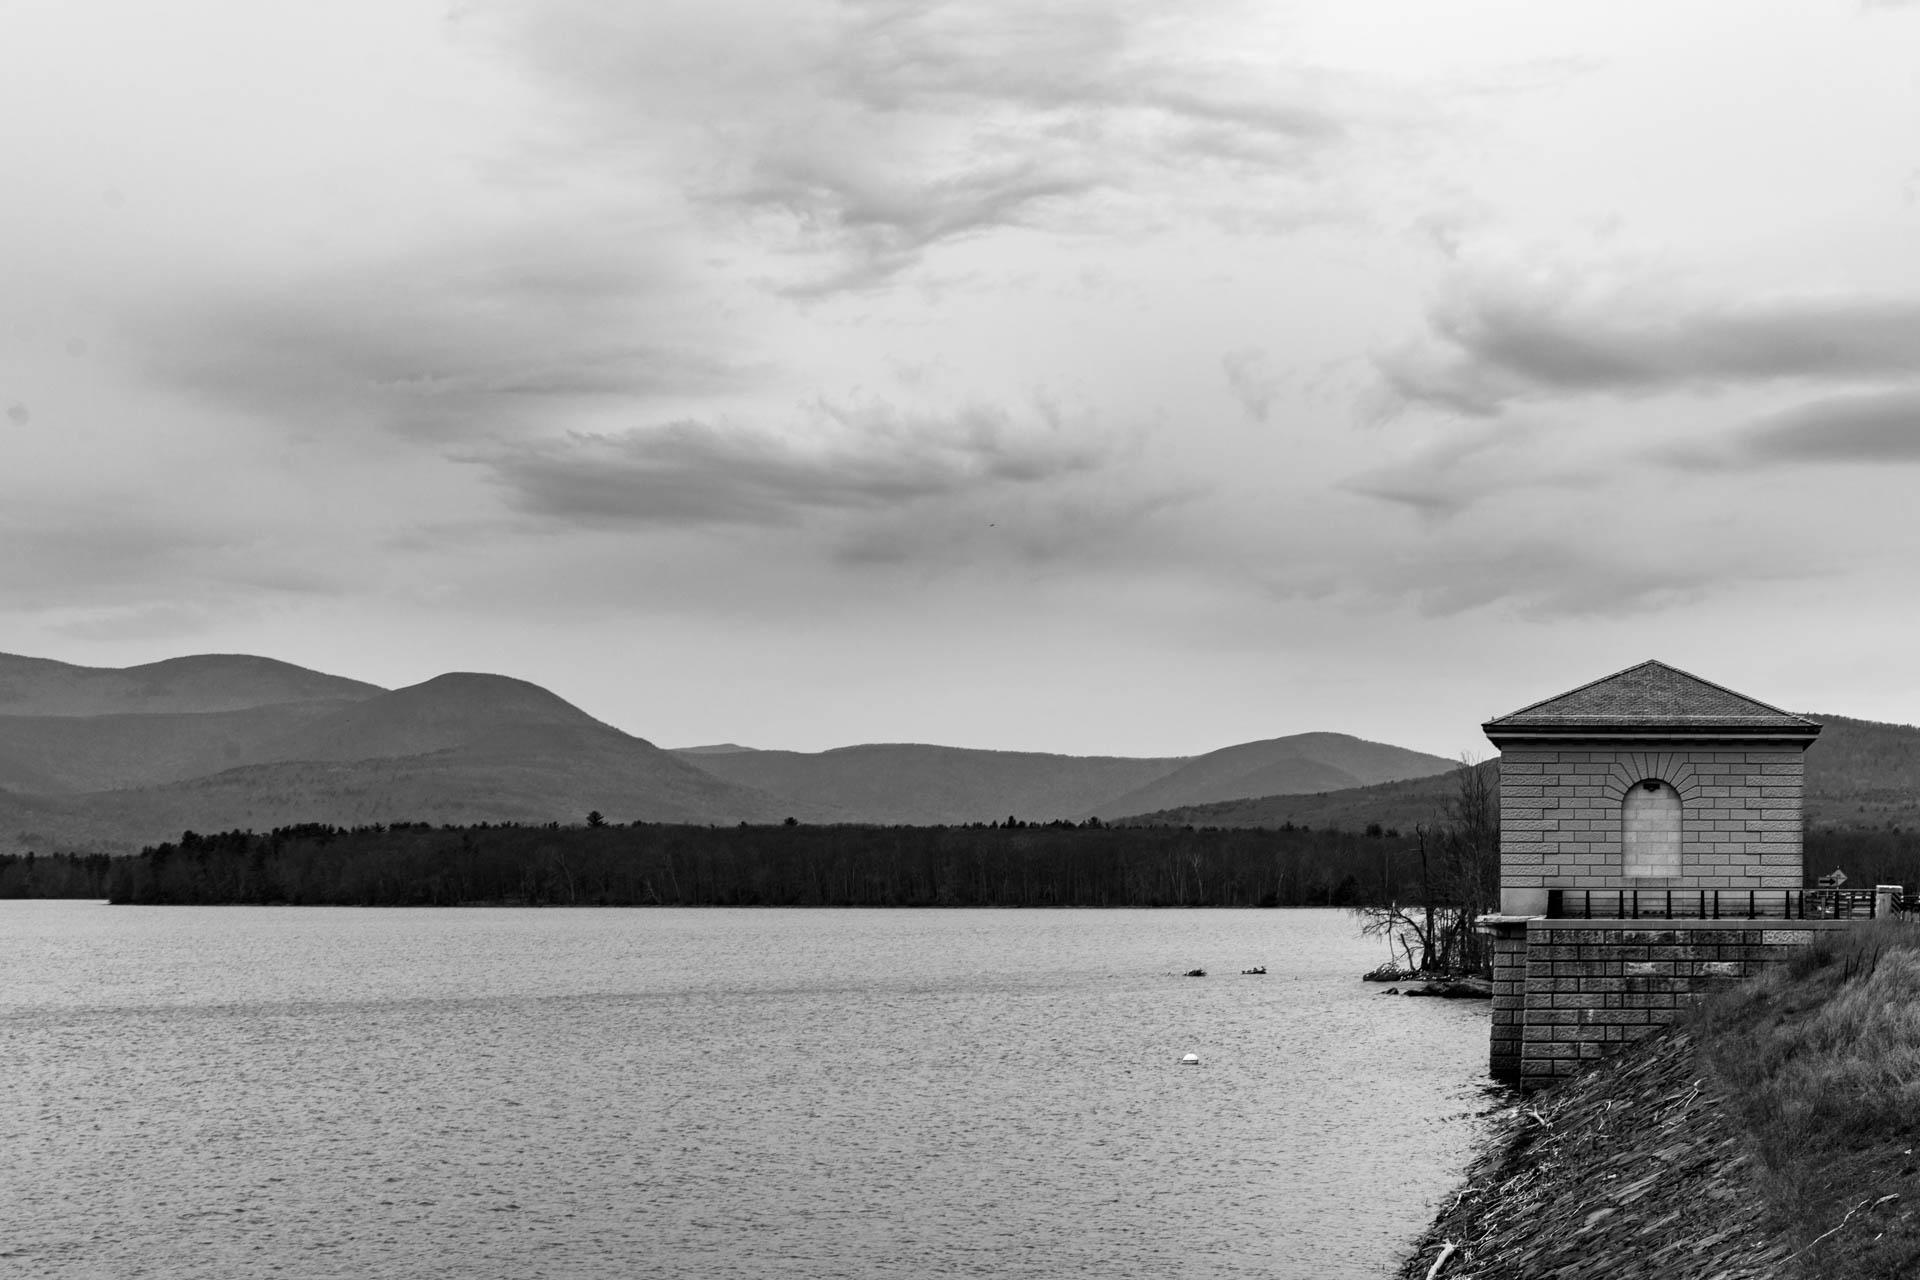 ashokan_reservoir-3.jpg